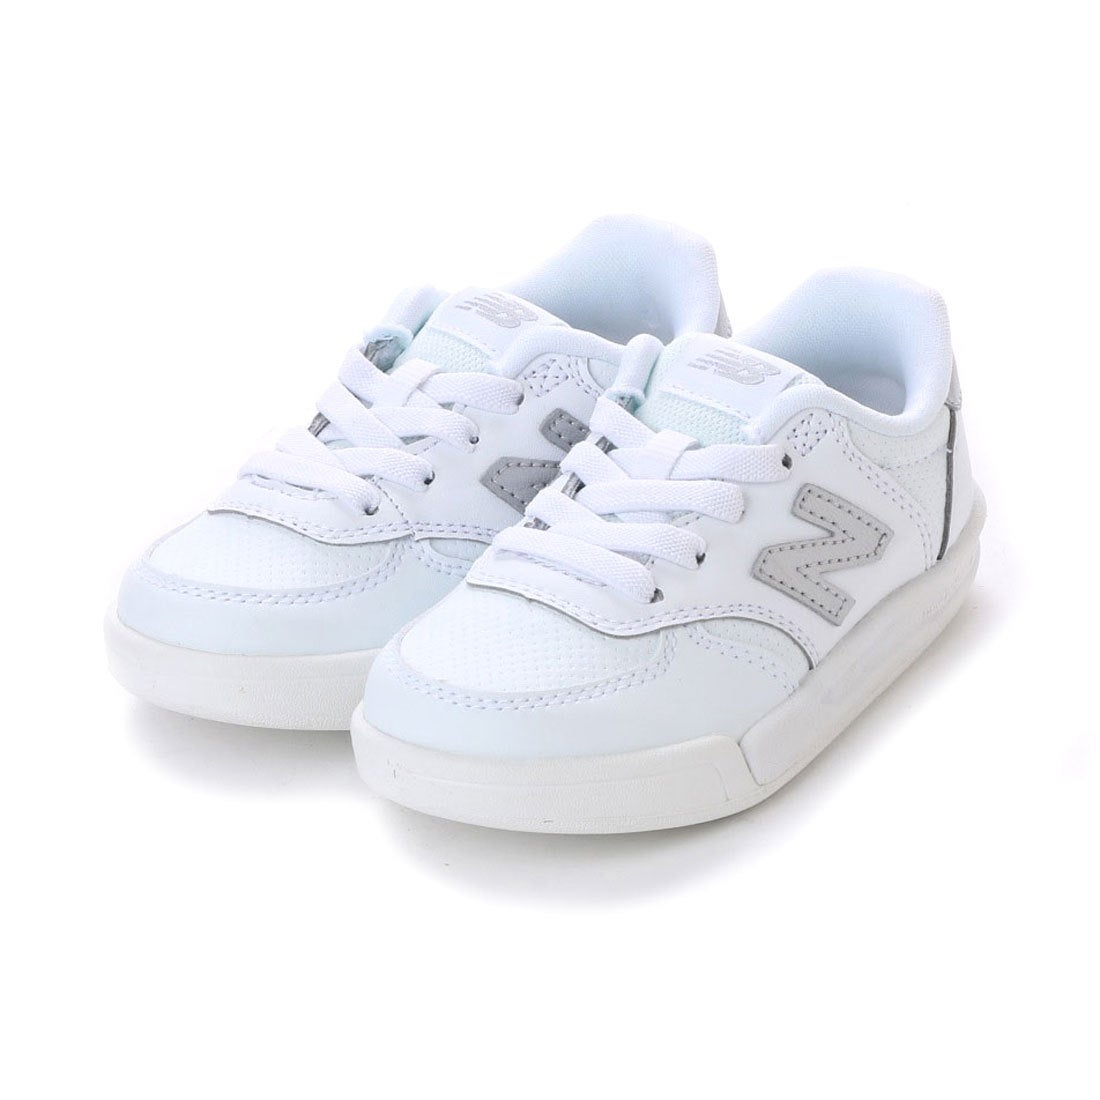 105c24f59ca8c ニューバランス new balance NB KT300 WTI (ホワイト/シルバー) -靴&ファッション通販 ロコンド〜自宅で試着、気軽に返品